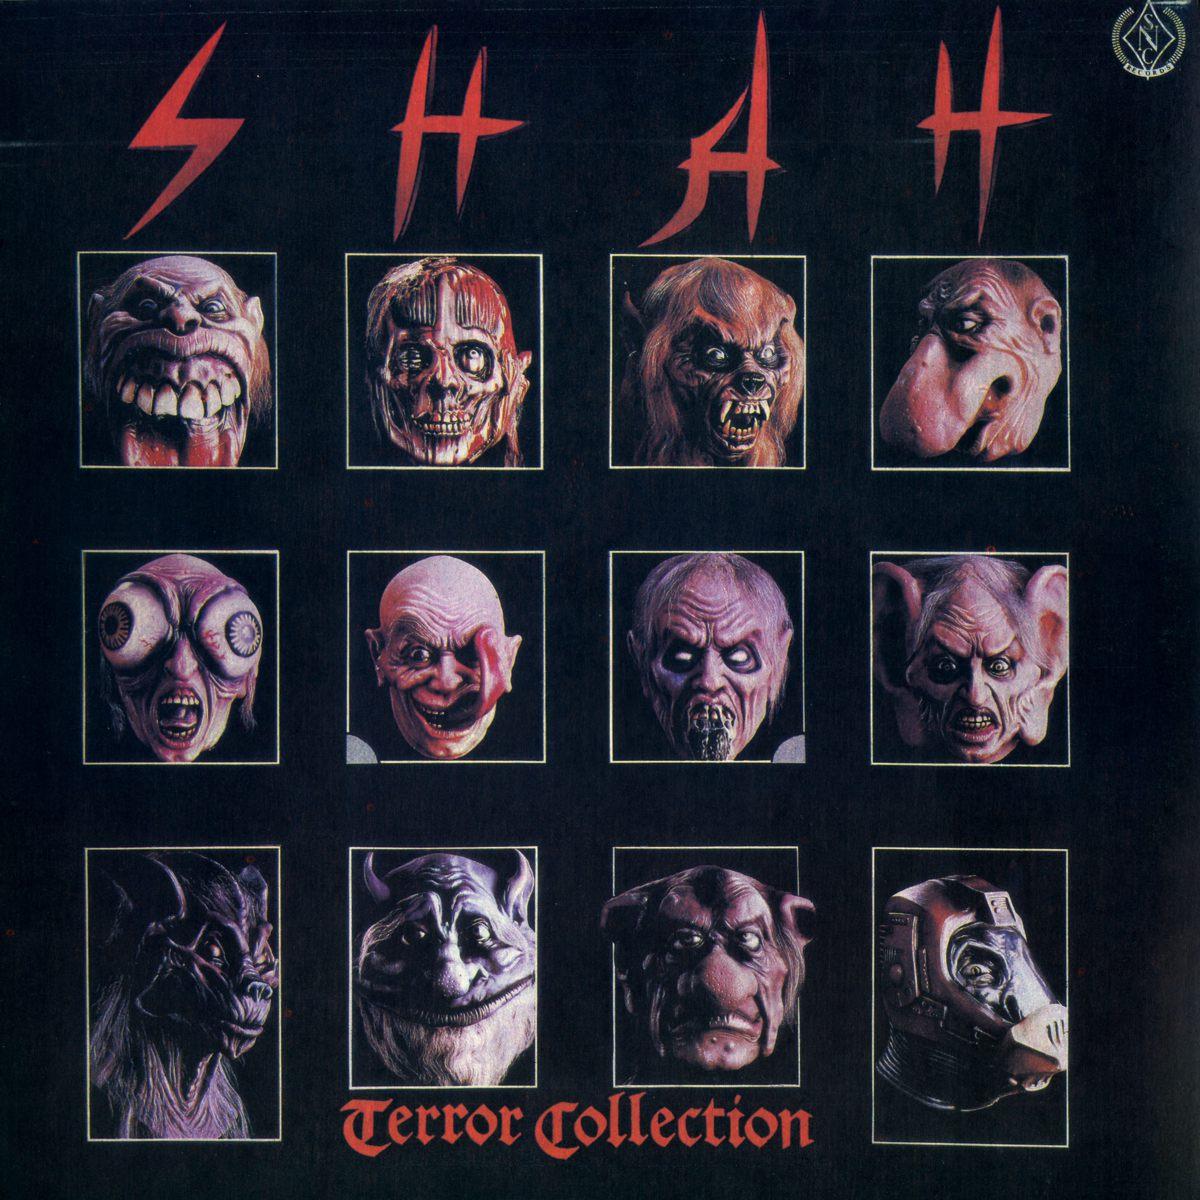 Shah - Terror Collection